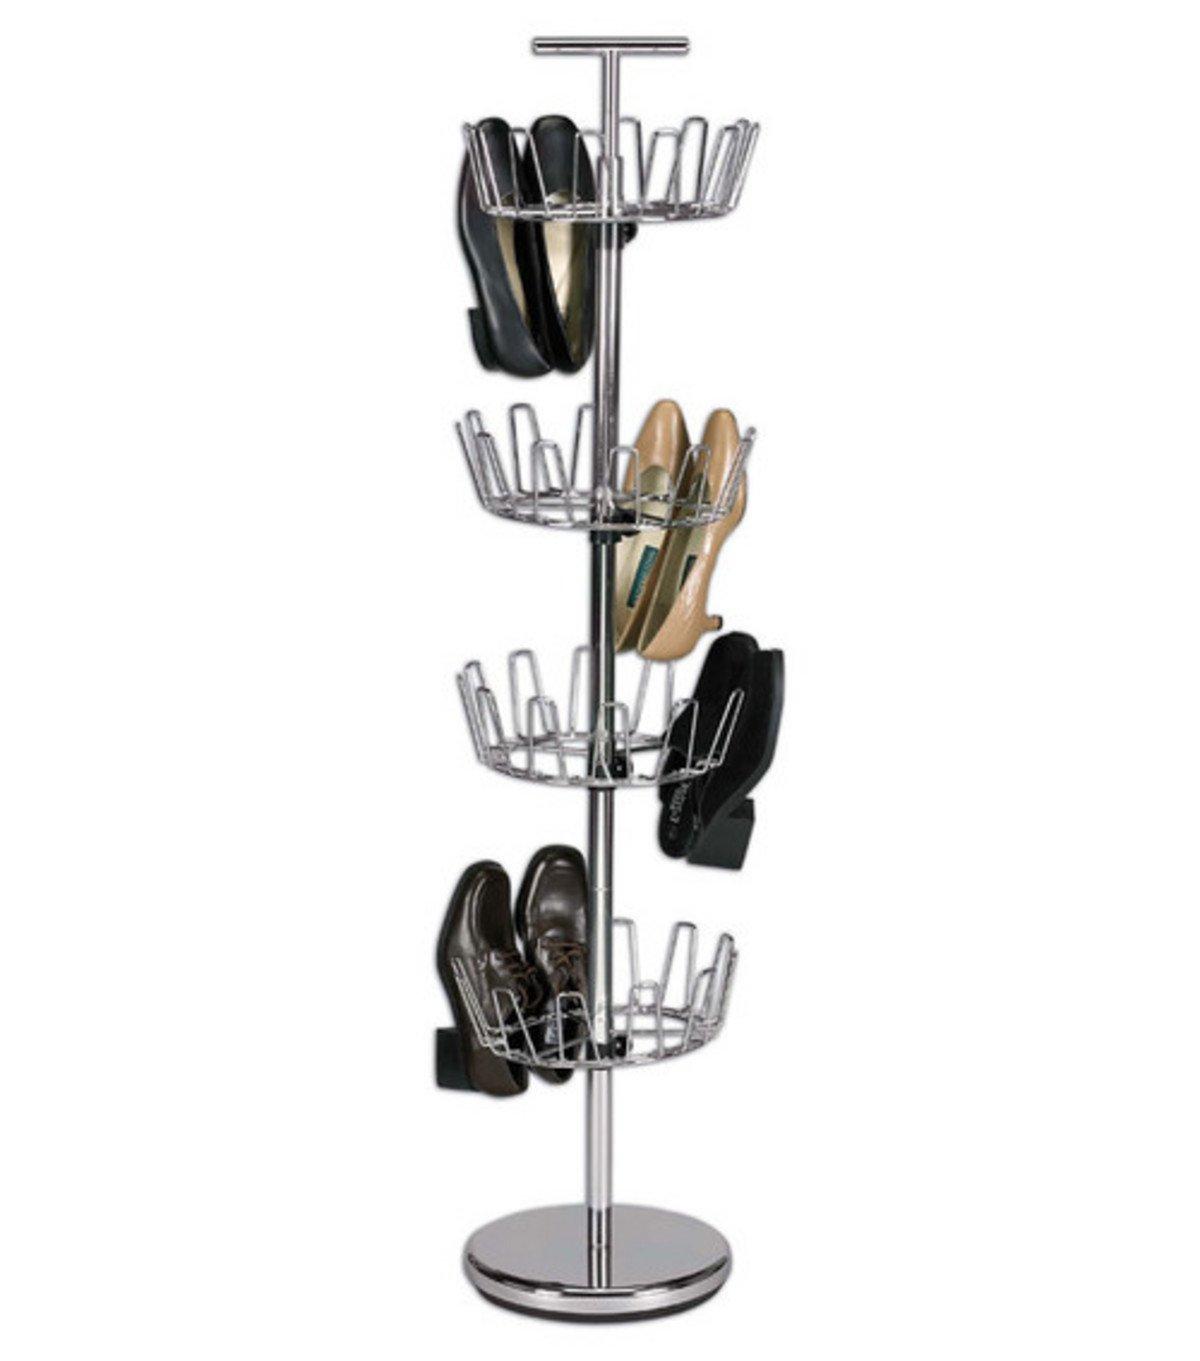 upright 24 revolving shoe organizer tree stand footwear